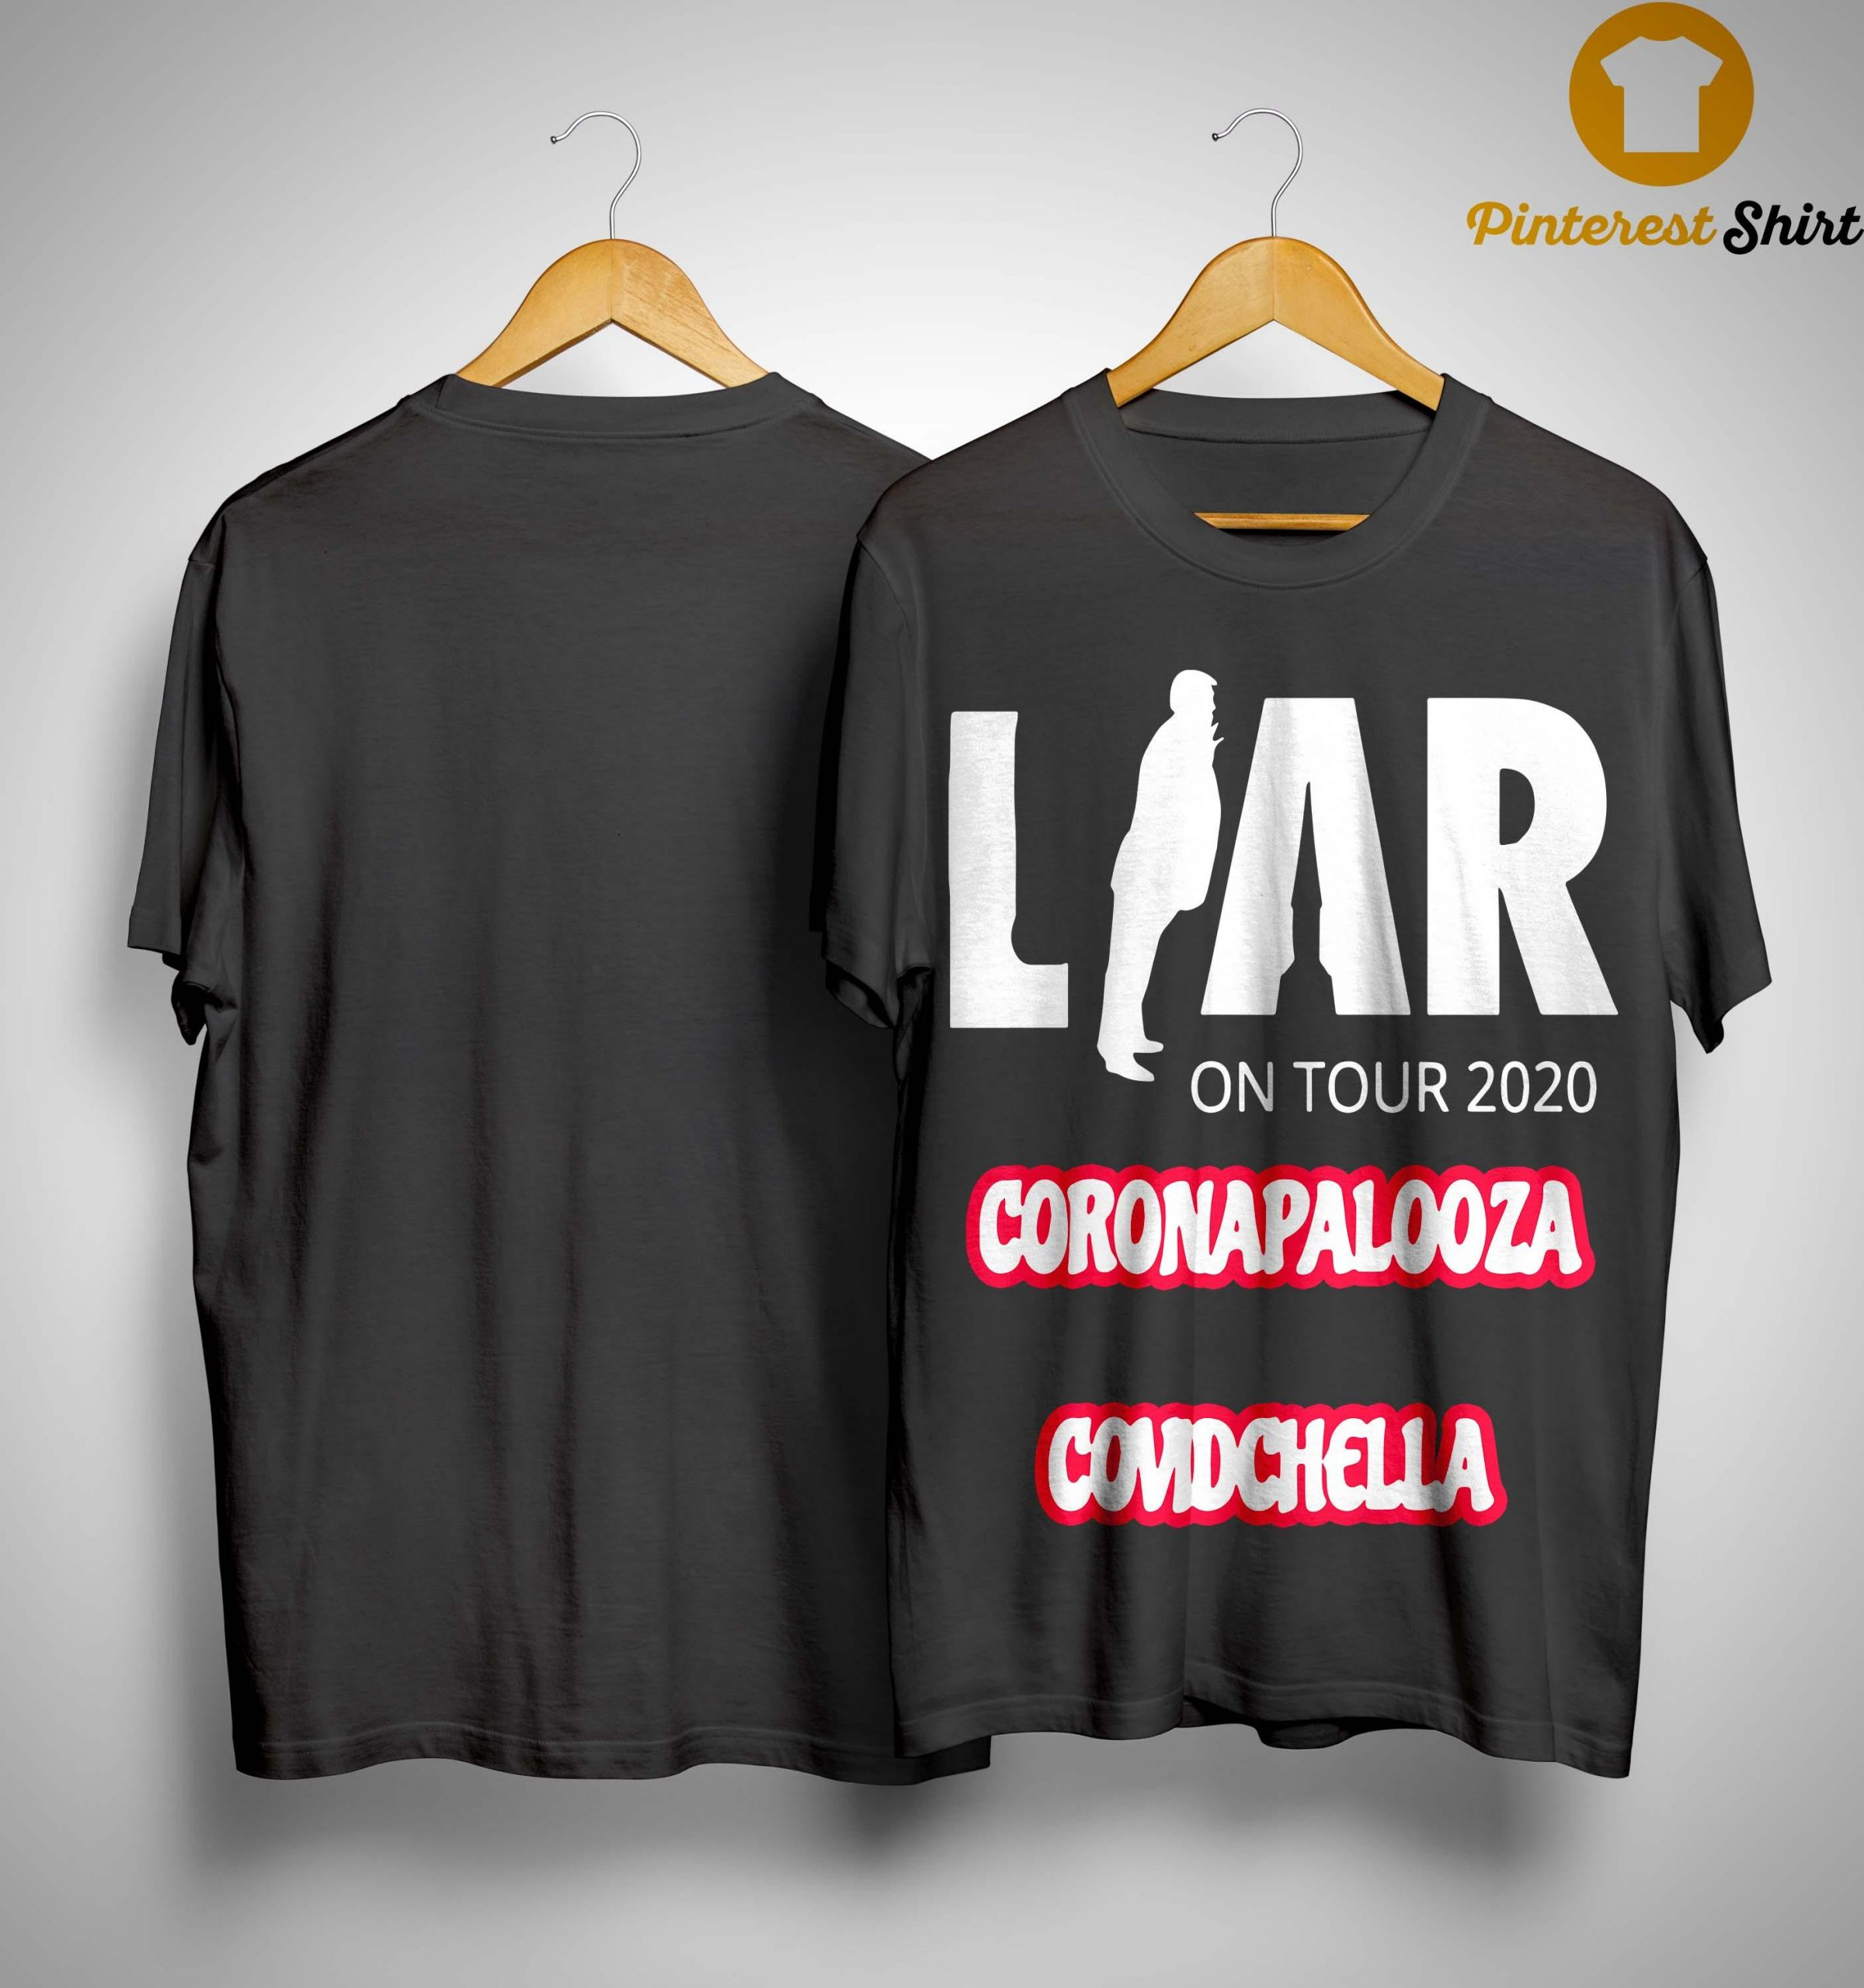 Liar On Tour 2020 Coronapalooza Covidchella Shirt